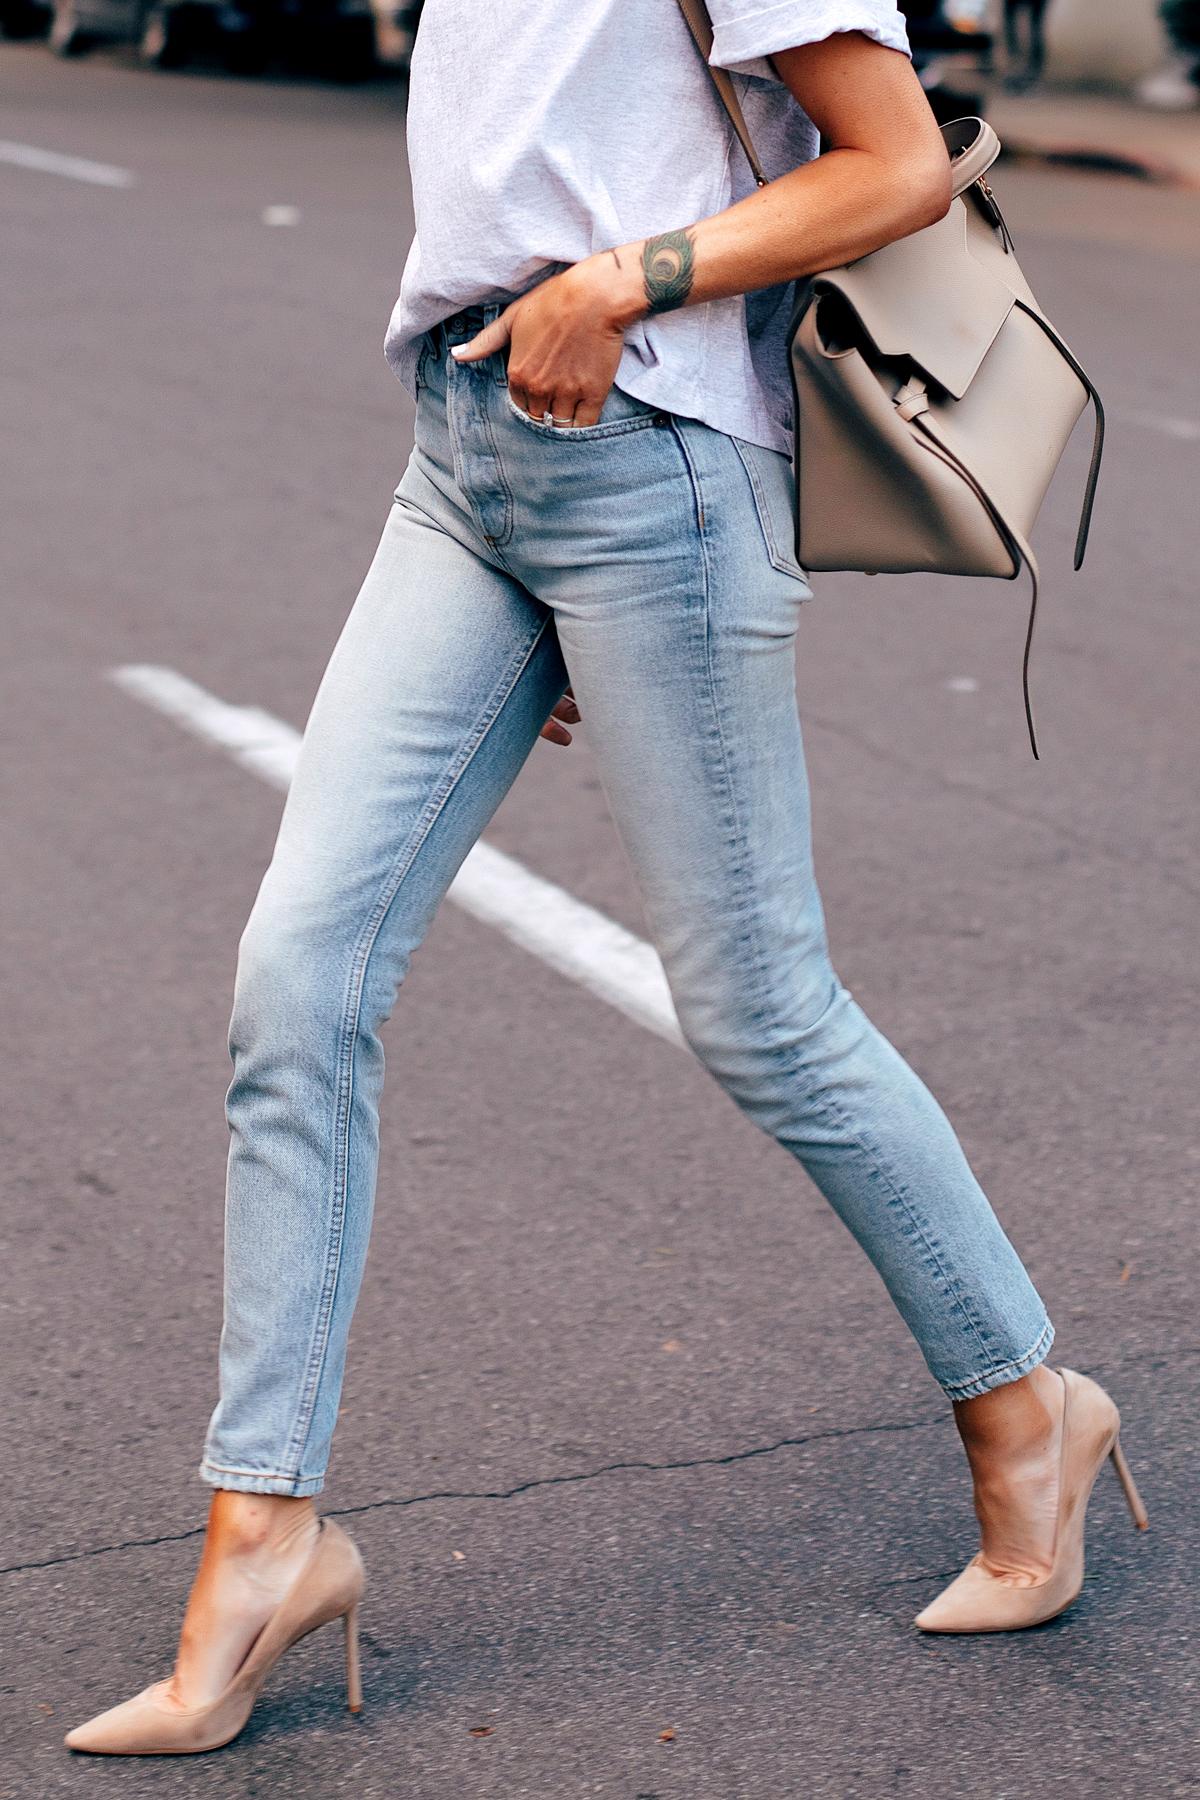 Woman Wearing Topshop Grey Tshirt Boyish High Rise Skinny Jeans Jimmy Choo Beige Romy Pumps Celine Mini Belt Bag Fashion Jackson San Diego Fashion Blogger Street Style